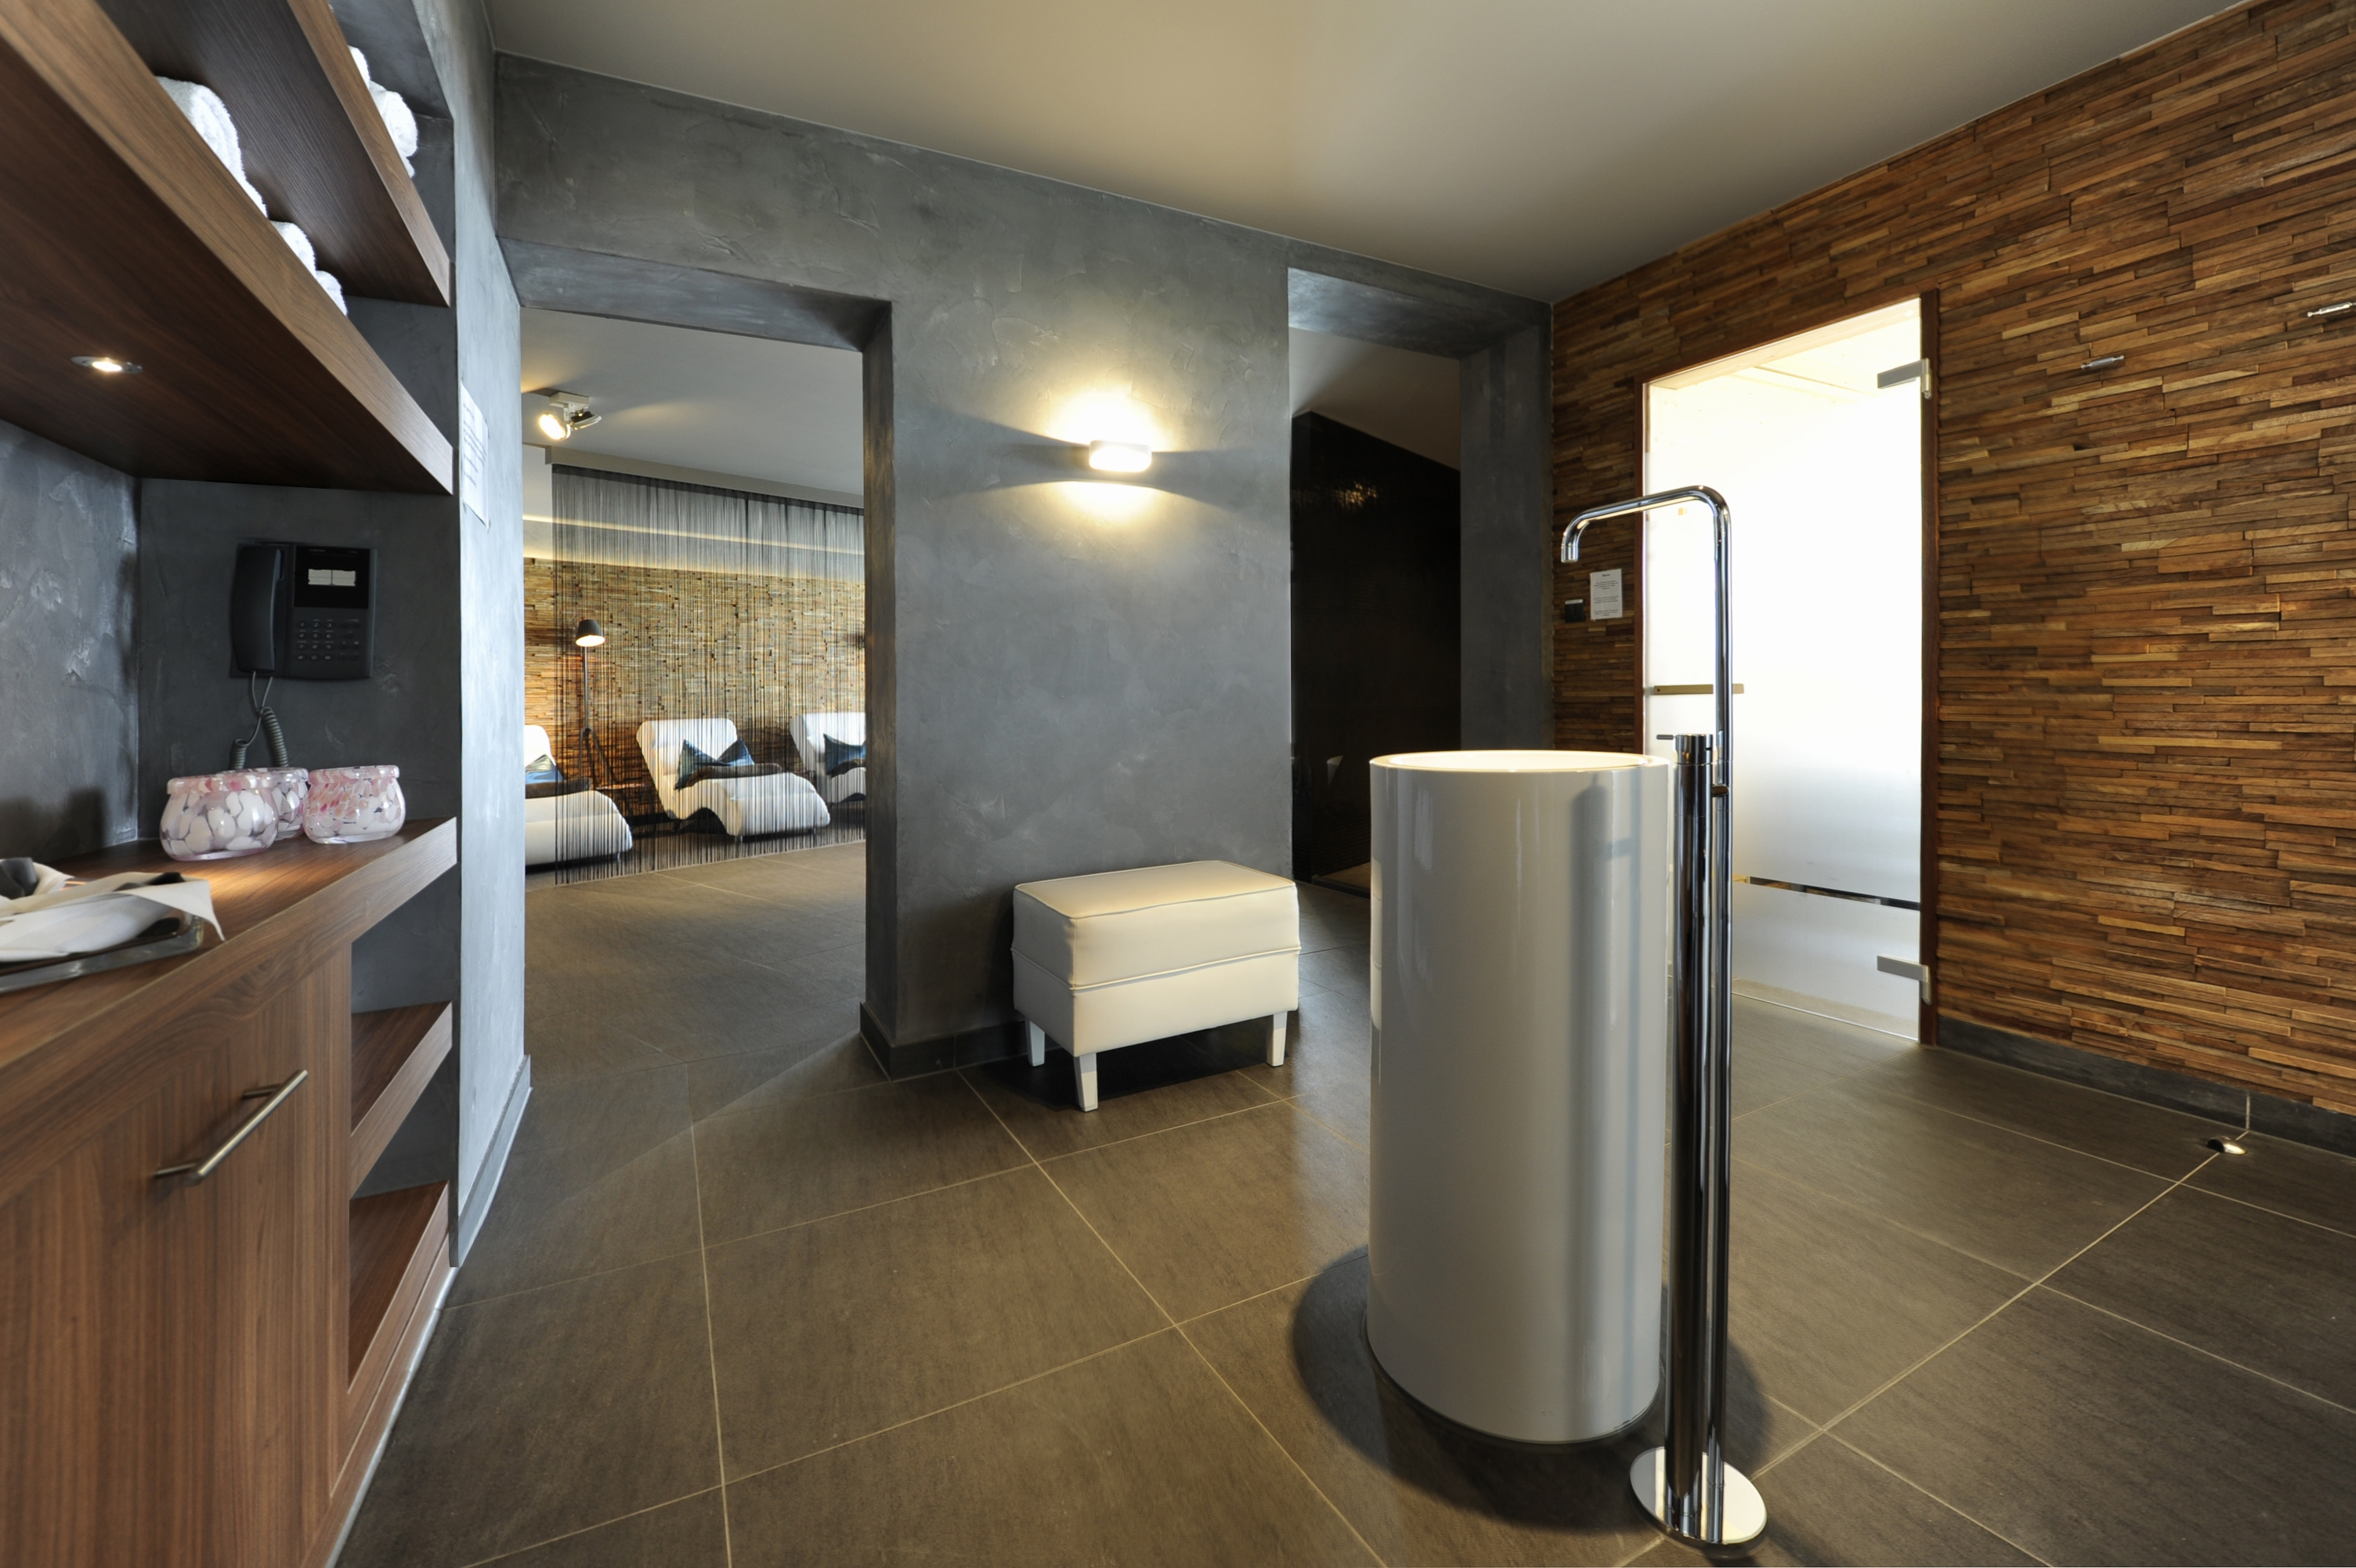 van-der-valk-hotel-melle-osnabruck thumbnail